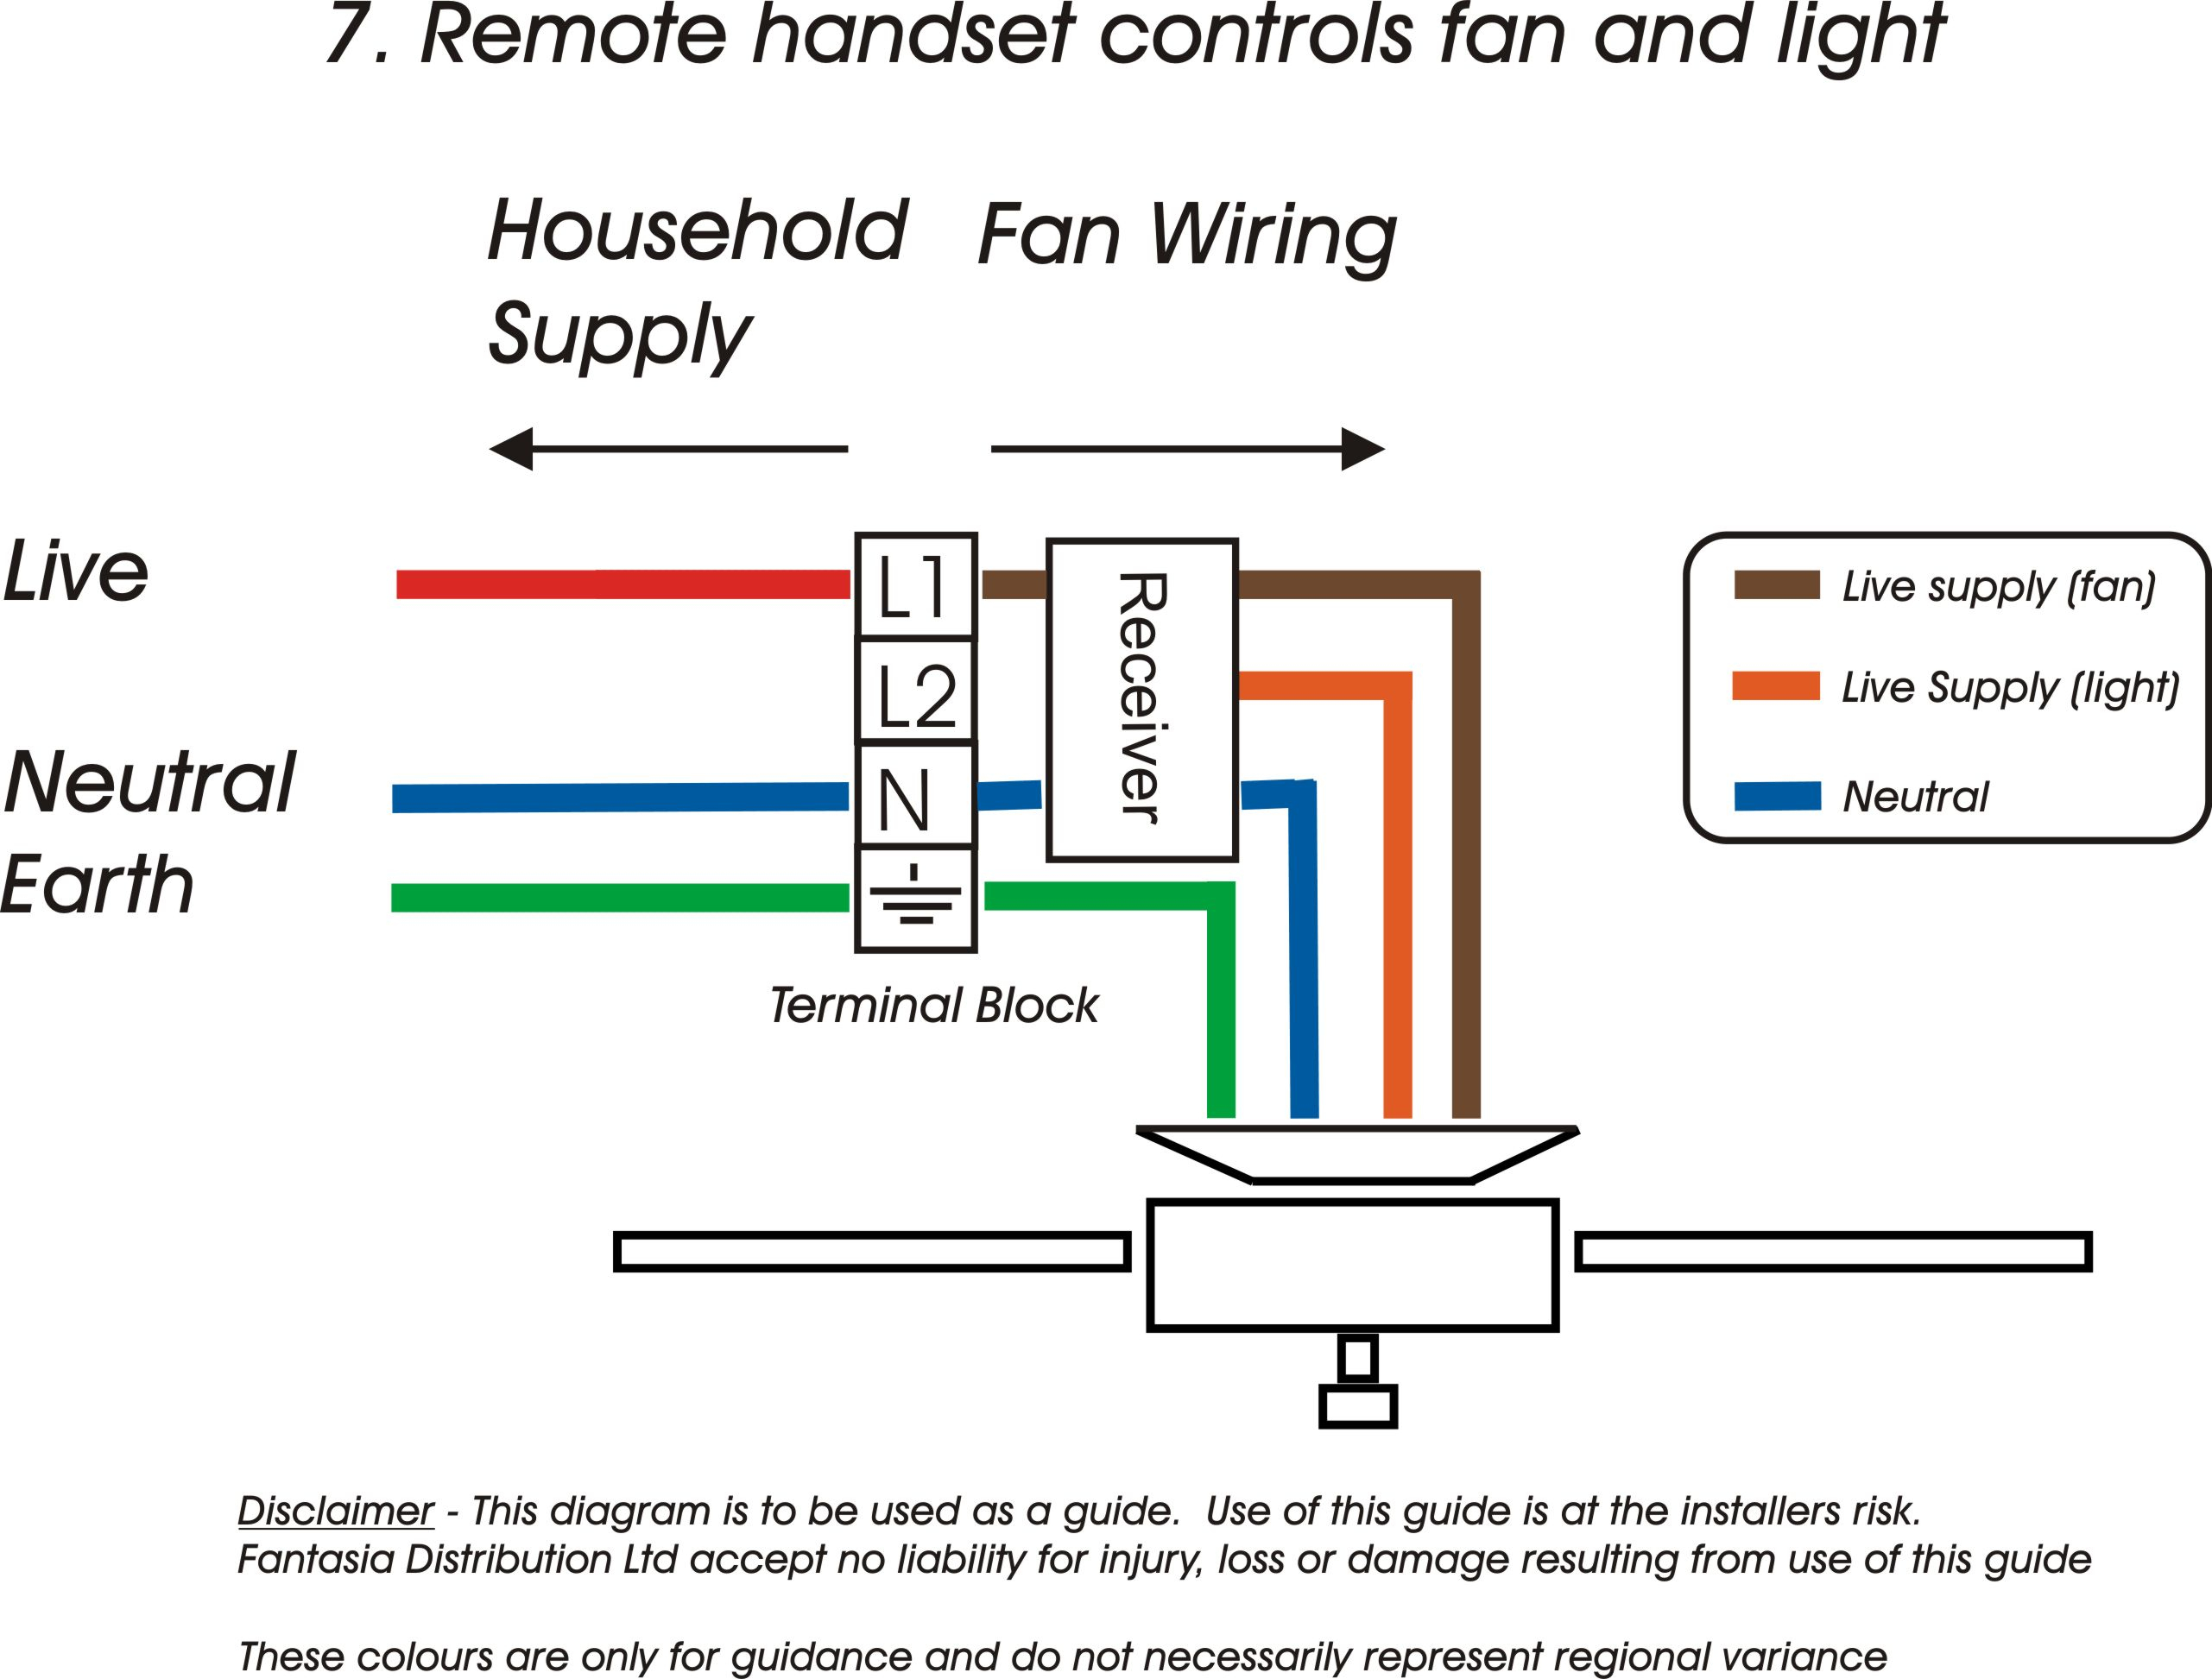 Fantasia Fans | Fantasia Ceiling Fans Wiring Information - Ceiling Fan Wall Switch Wiring Diagram